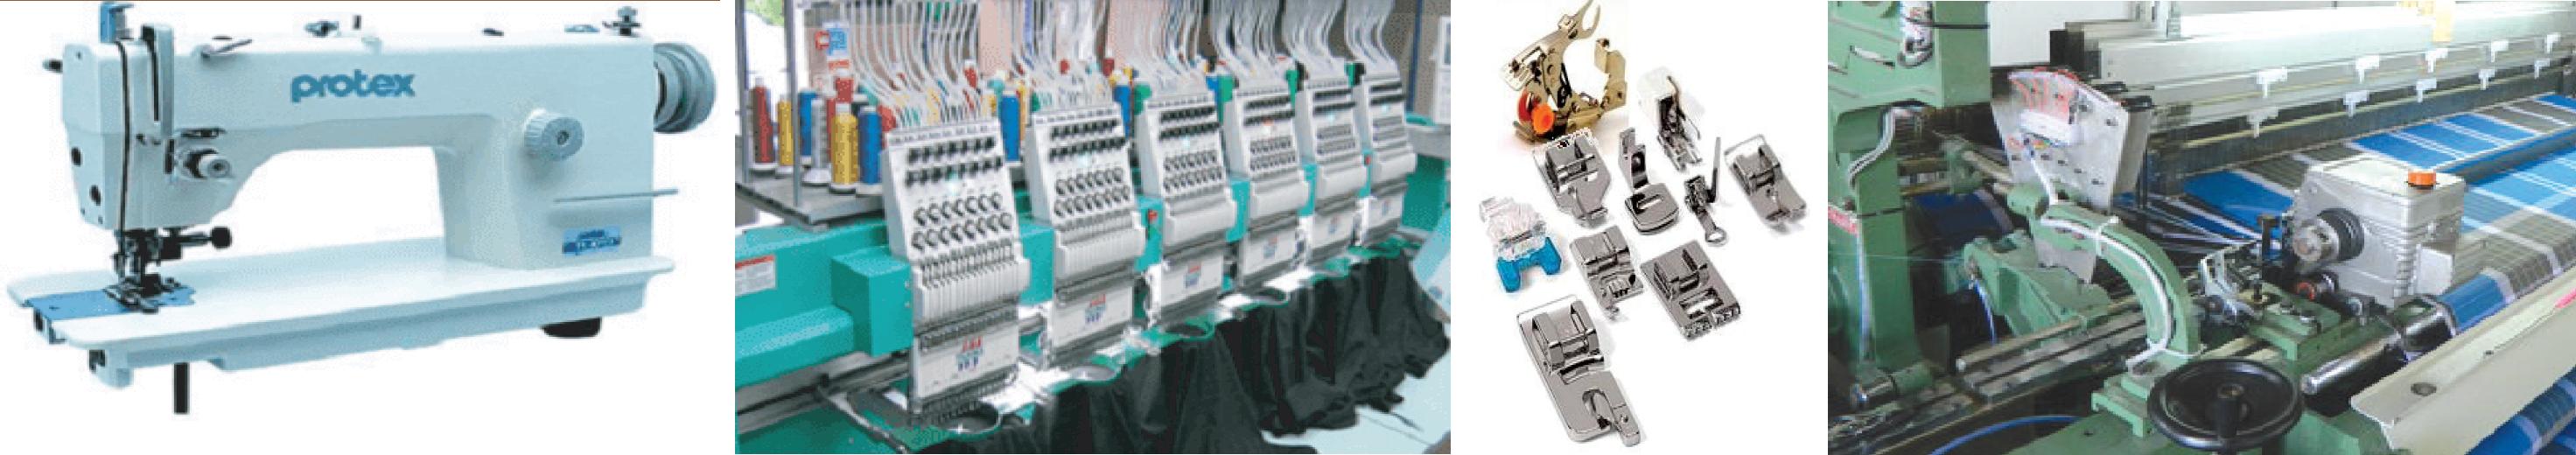 SaigonTex 2019 - Vietnam Saigon Textile & Garment Industry Expo